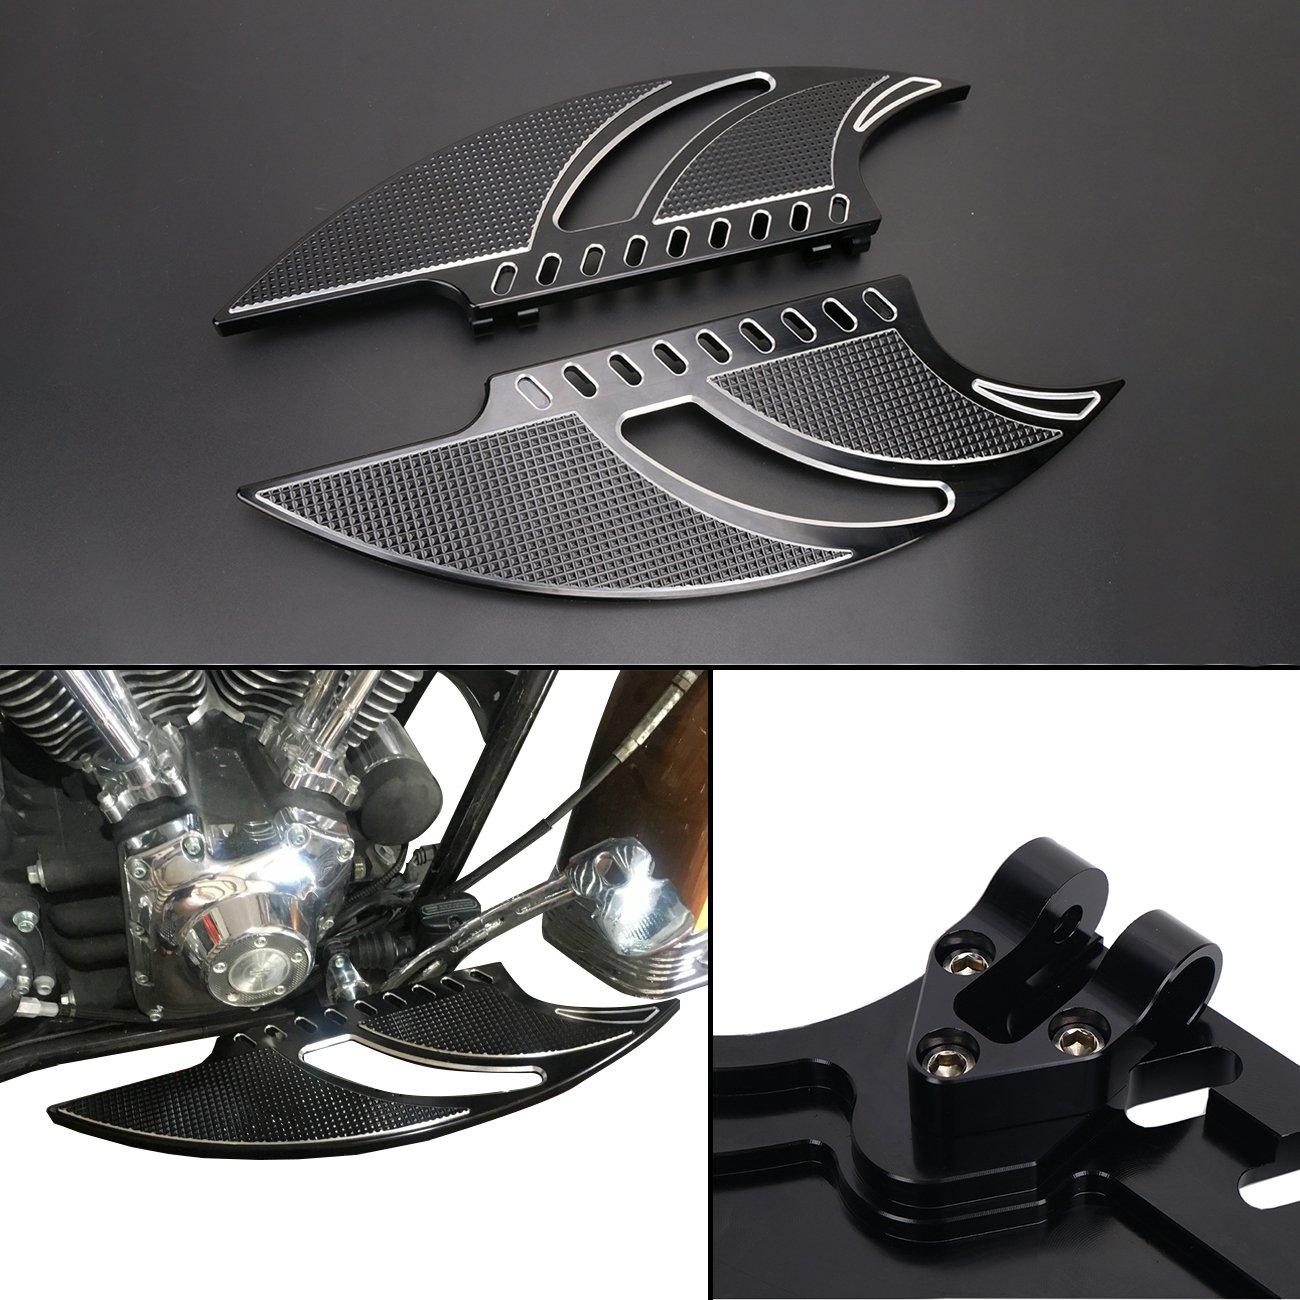 E-Most Black Deep Cut Flame Driver Stretched Floorboards for Harley FLH FLST FLD Parts